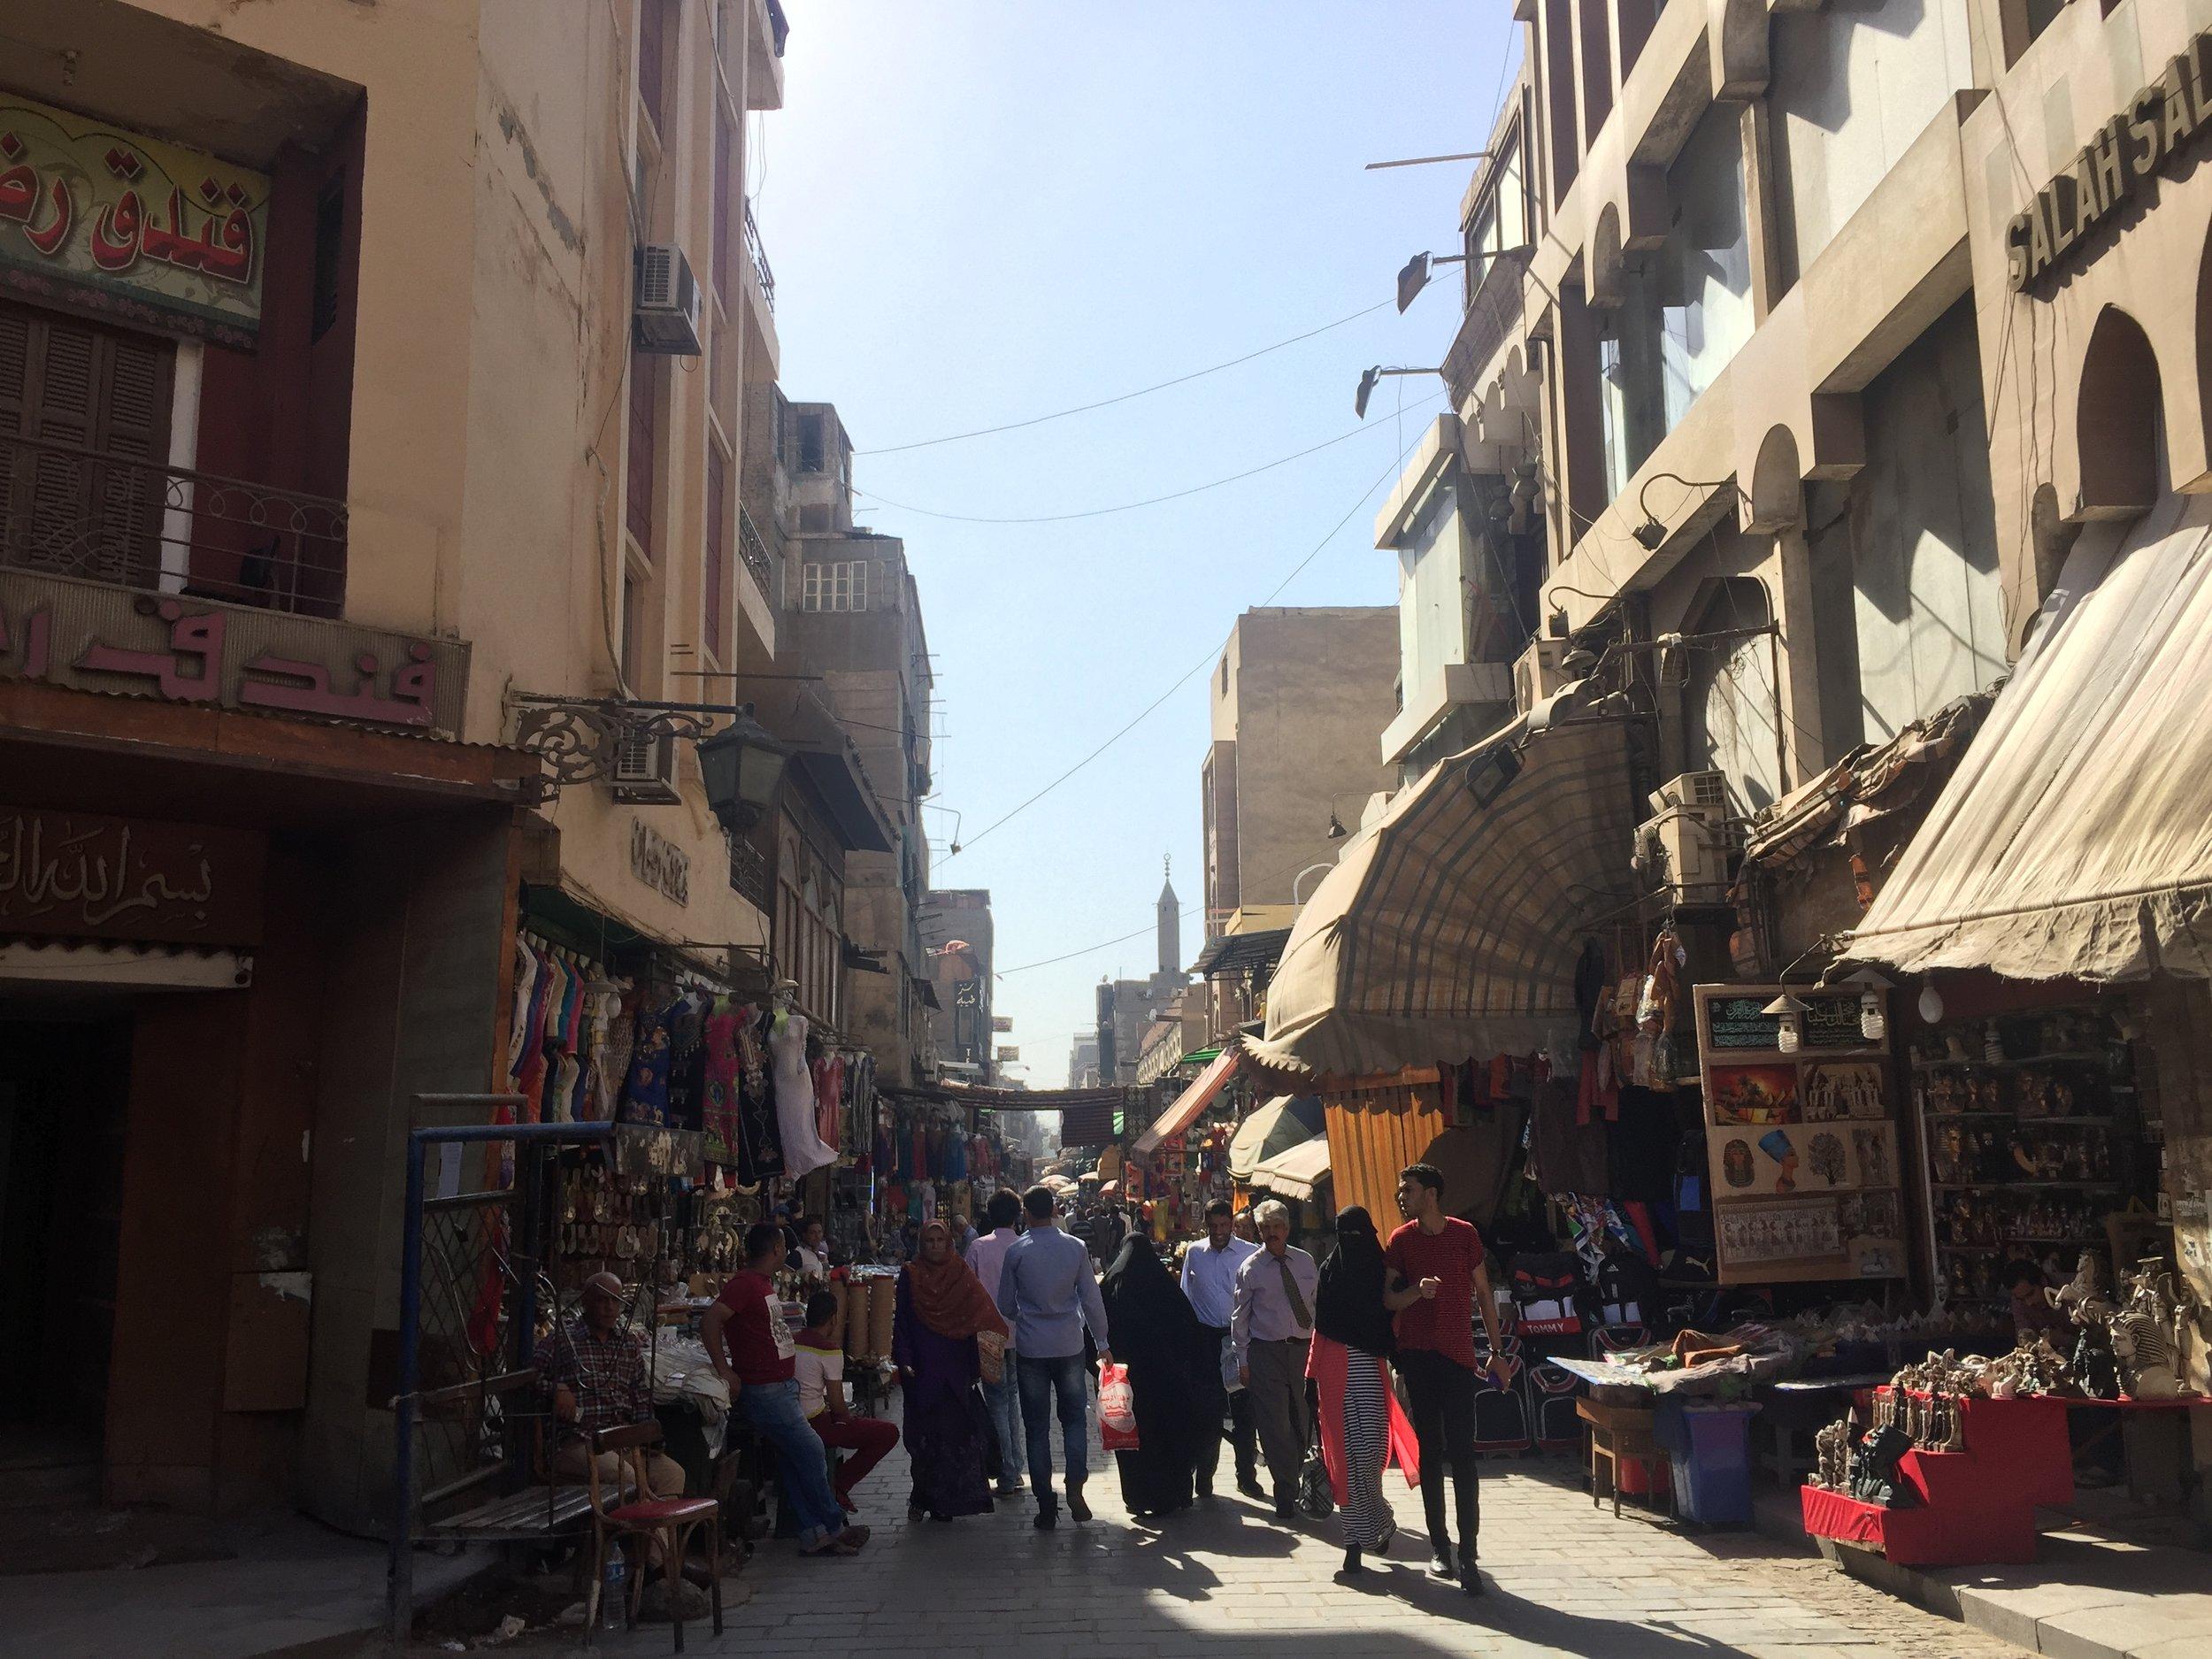 The crowded streets of Khan Al-Khalili market.